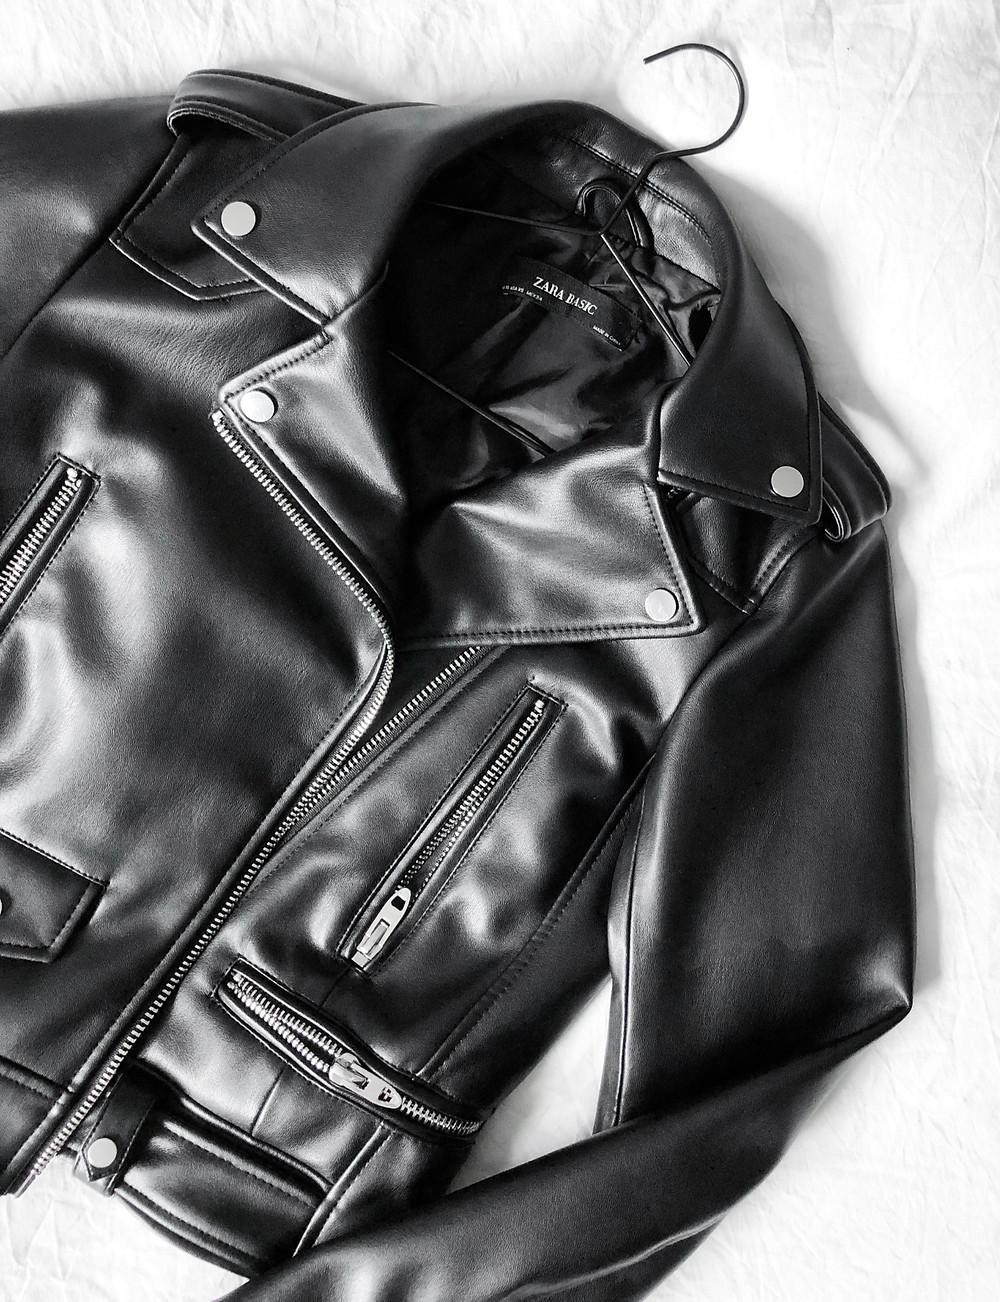 A Black Leather Jacket - The Midas Touch -  Tasmiya Shaikh